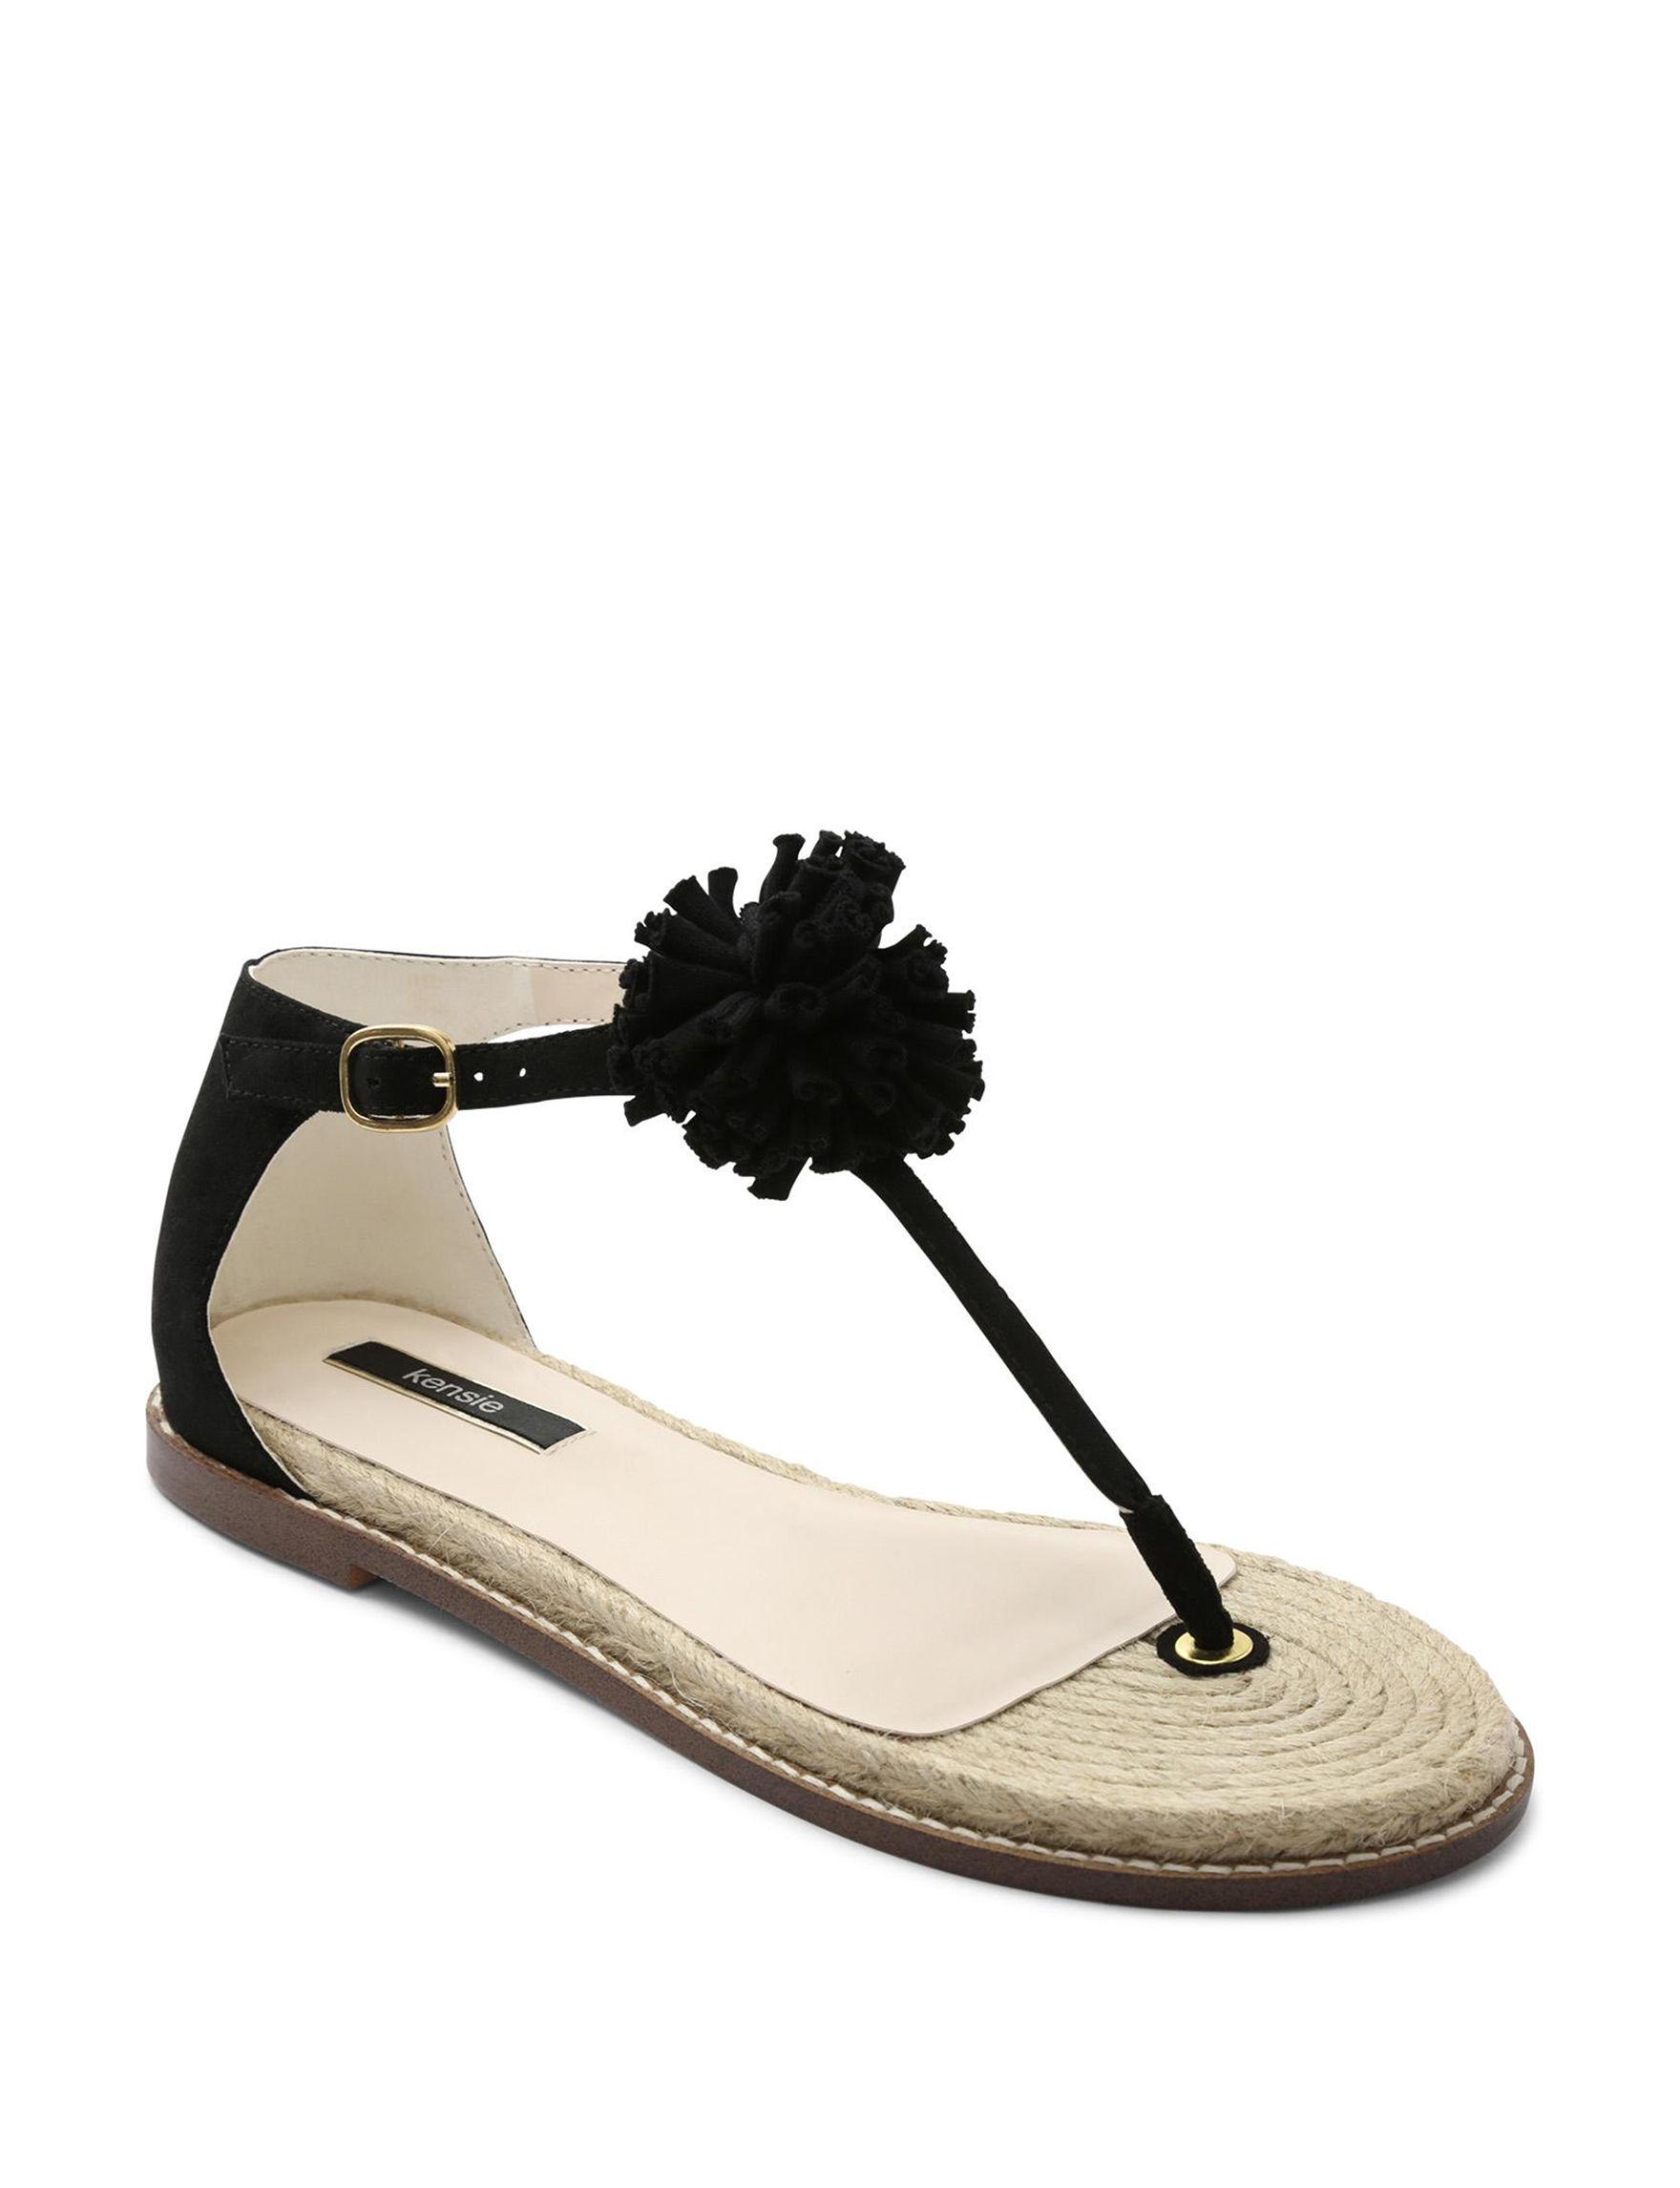 Kensie Black Espadrille Flat Sandals